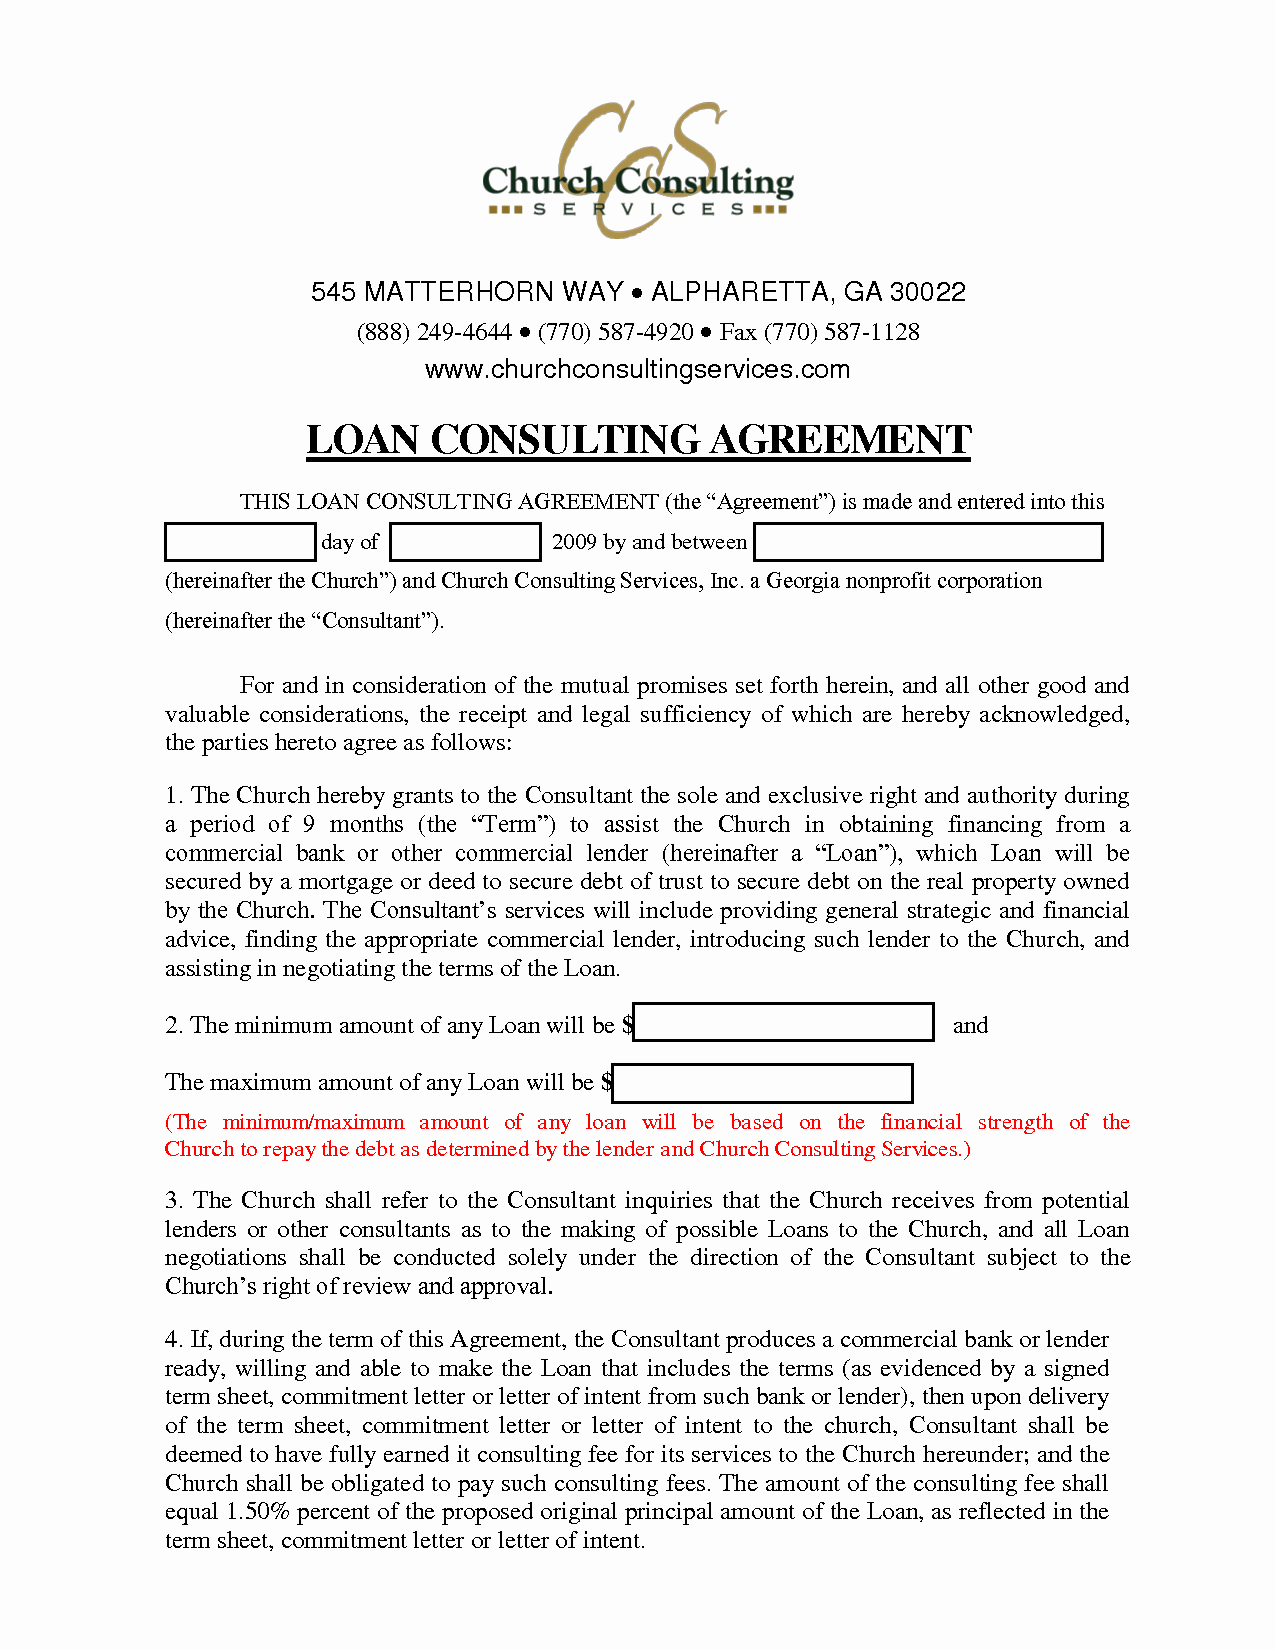 Bank Loan Proposal Template – Doggiedesigneu Within Business Proposal Template For Bank Loan